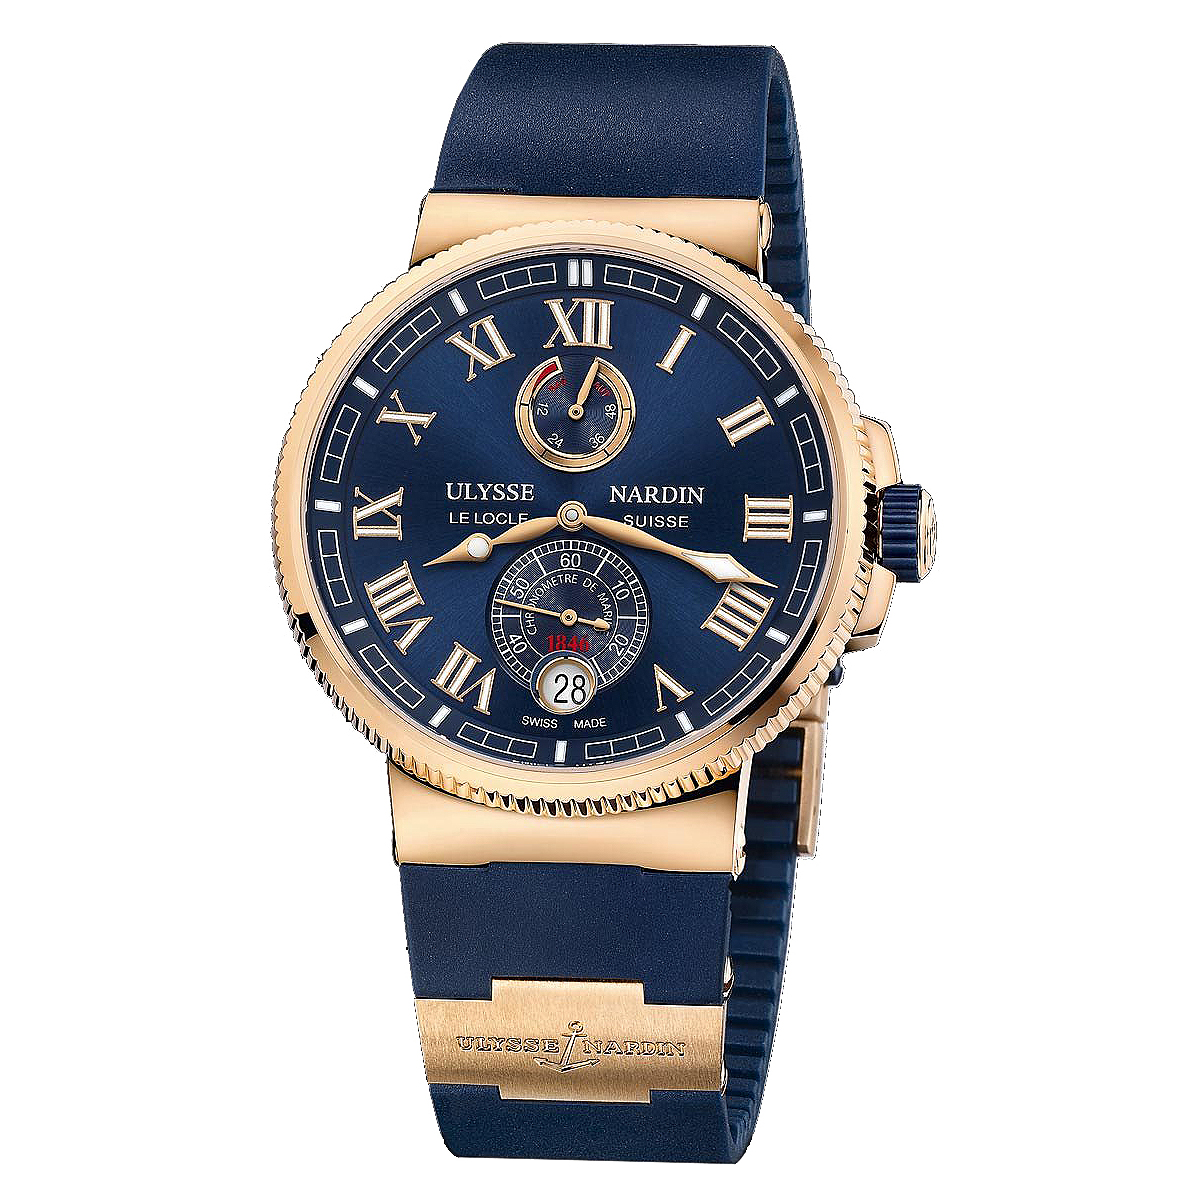 Marine Chronometer Manufacture 43mm 1186-126-3/43